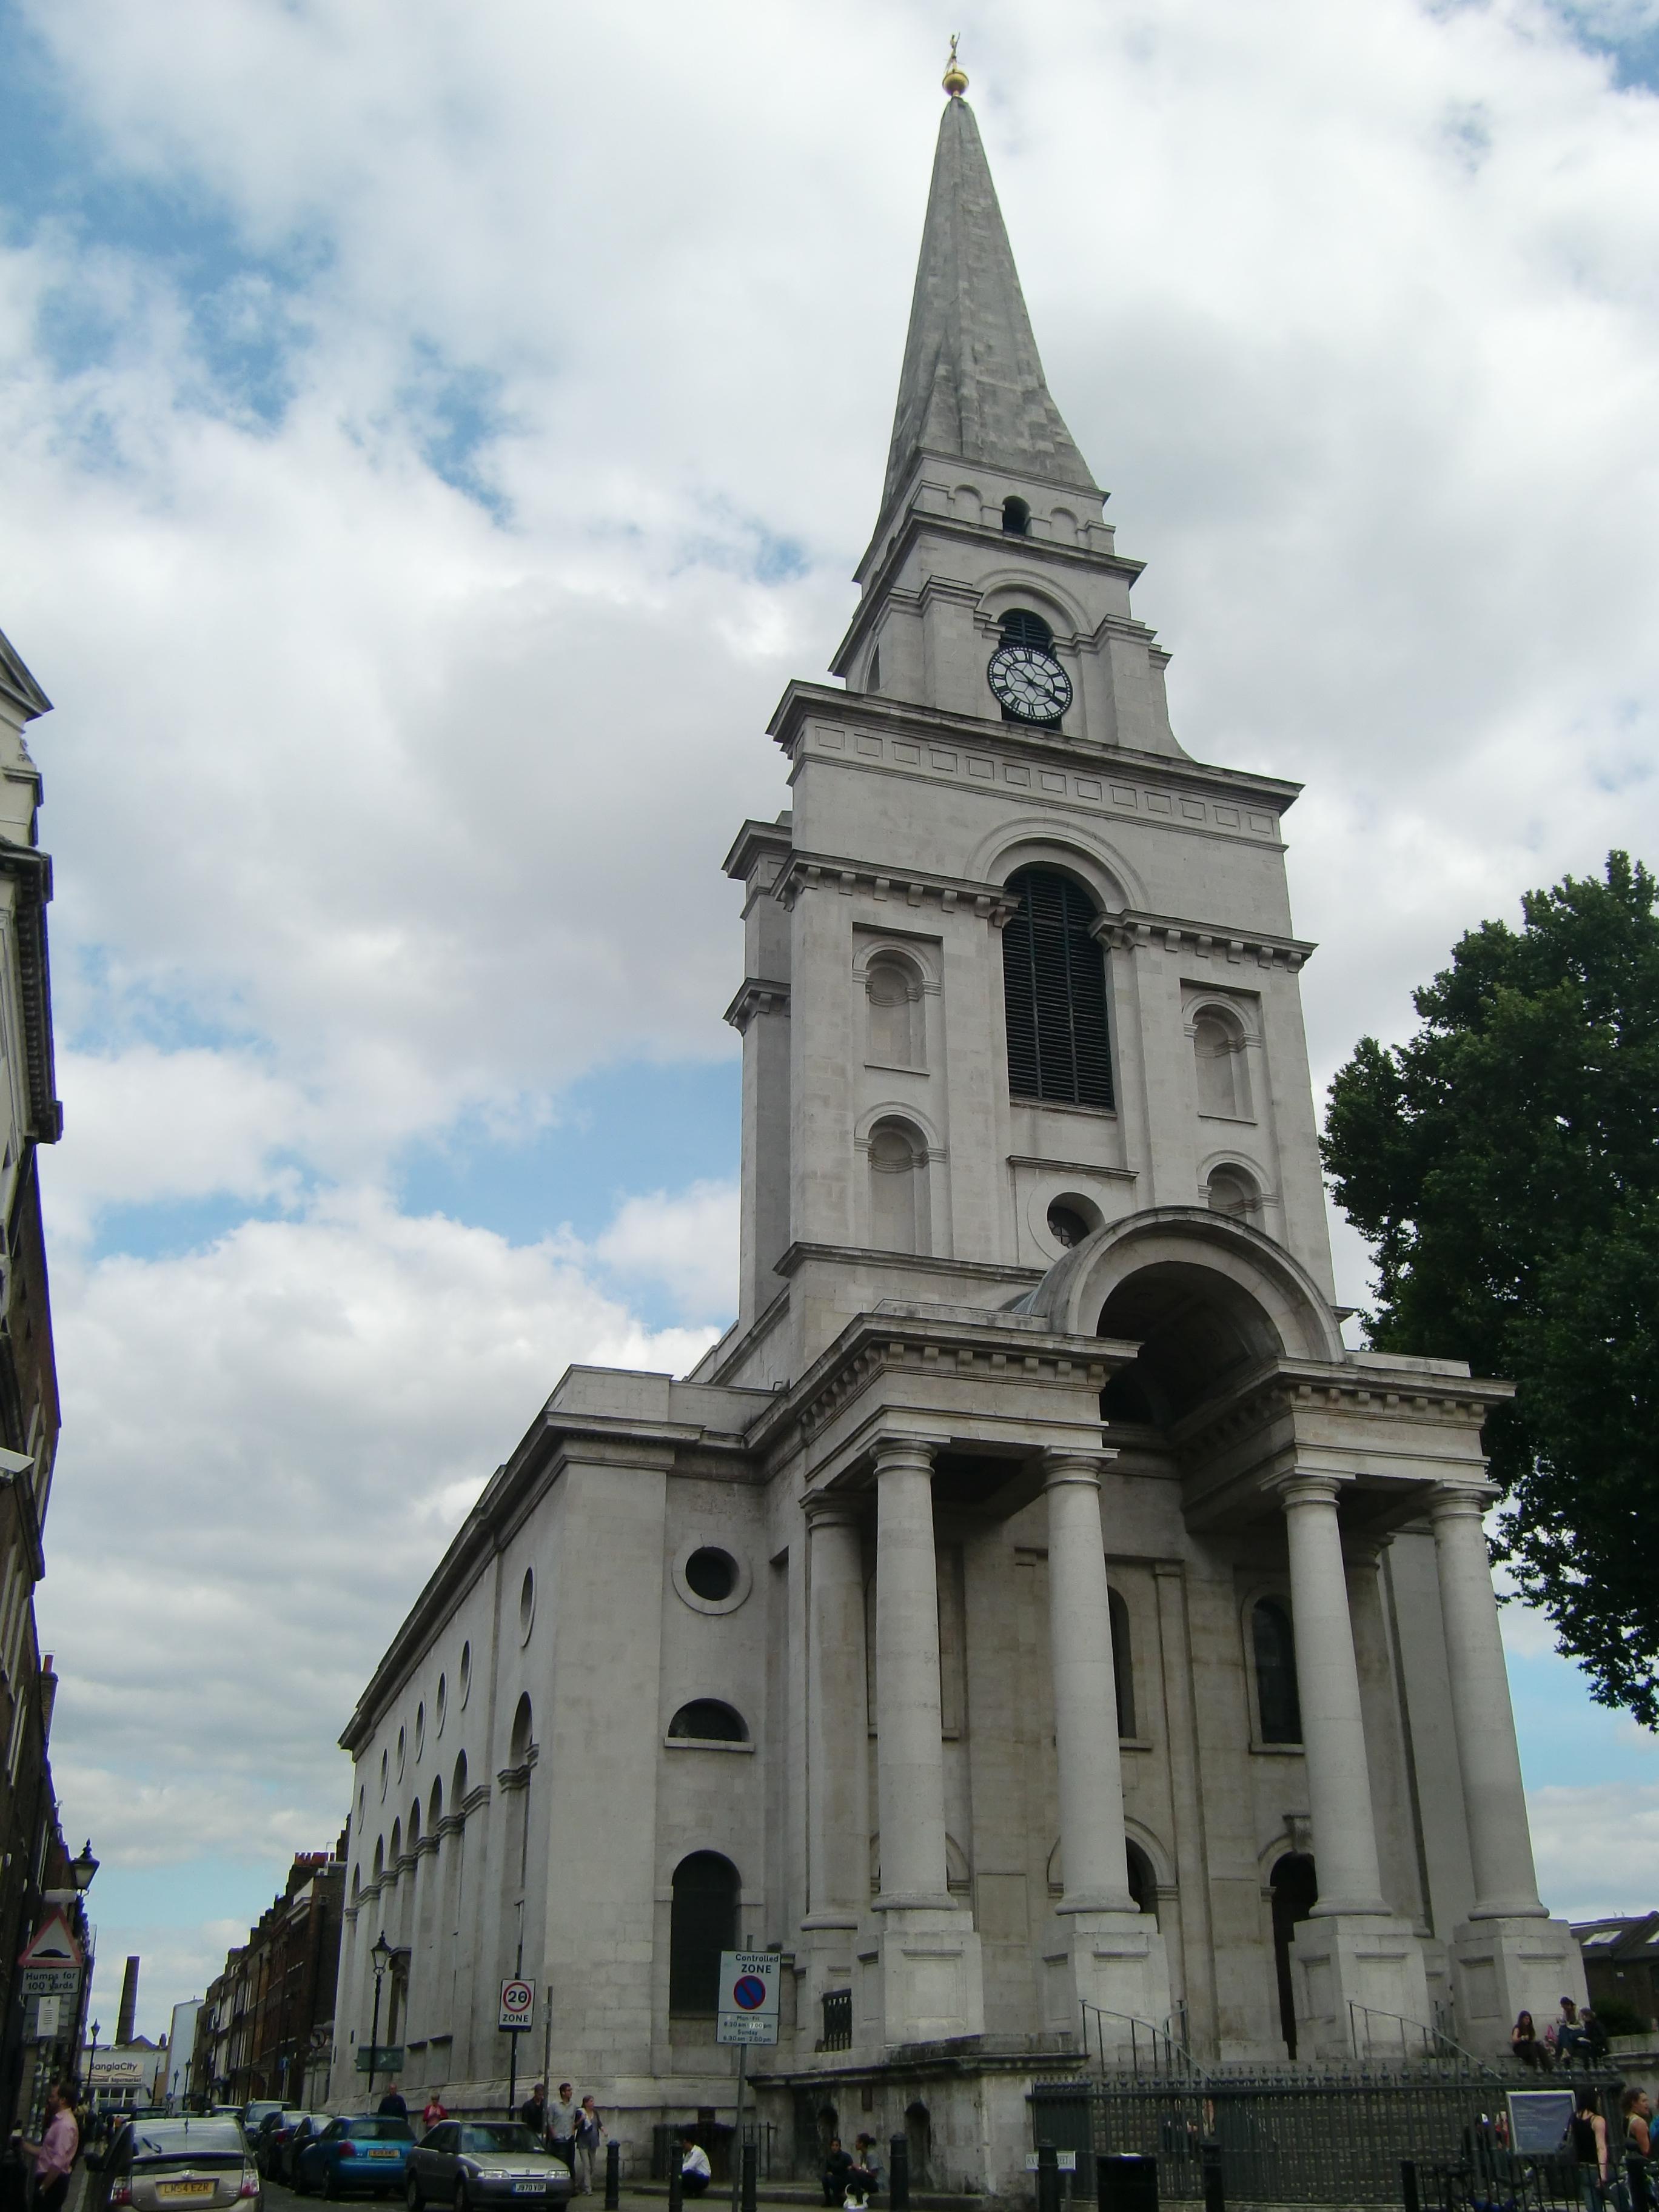 Spitalfields London: File:Christ Church, Spitalfields, London 02.JPG